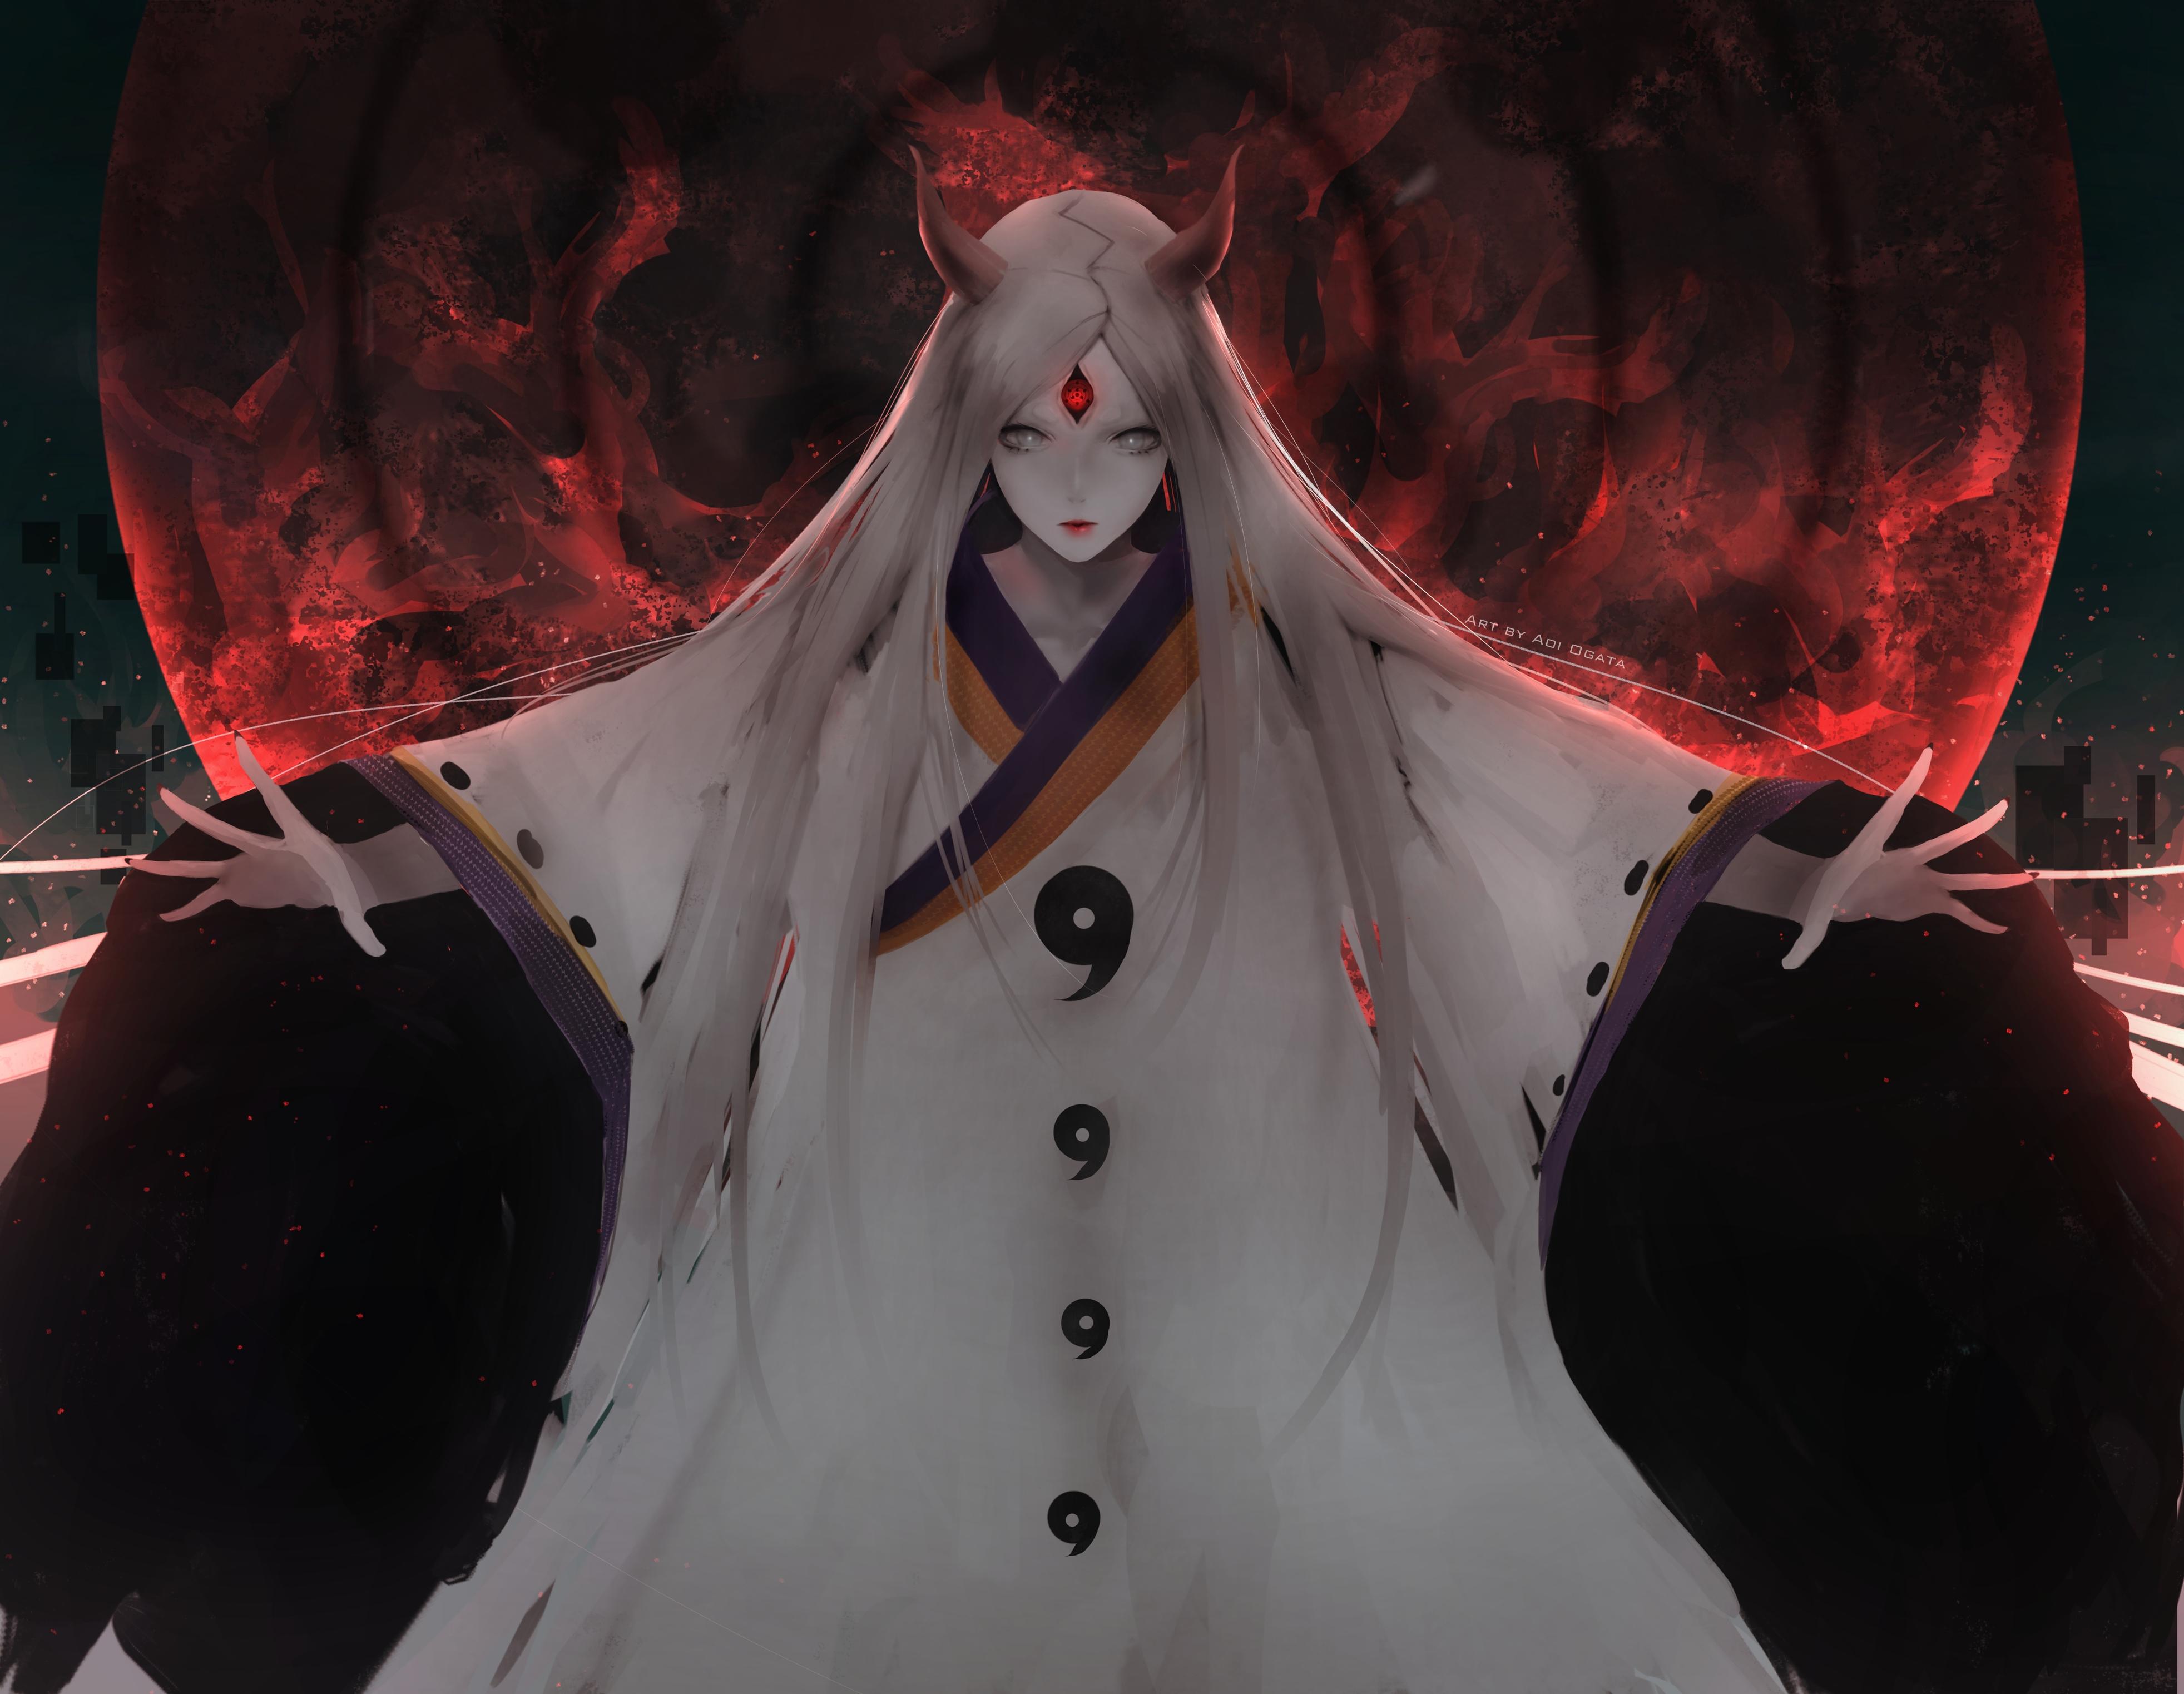 Anime Naruto Artwork 4k